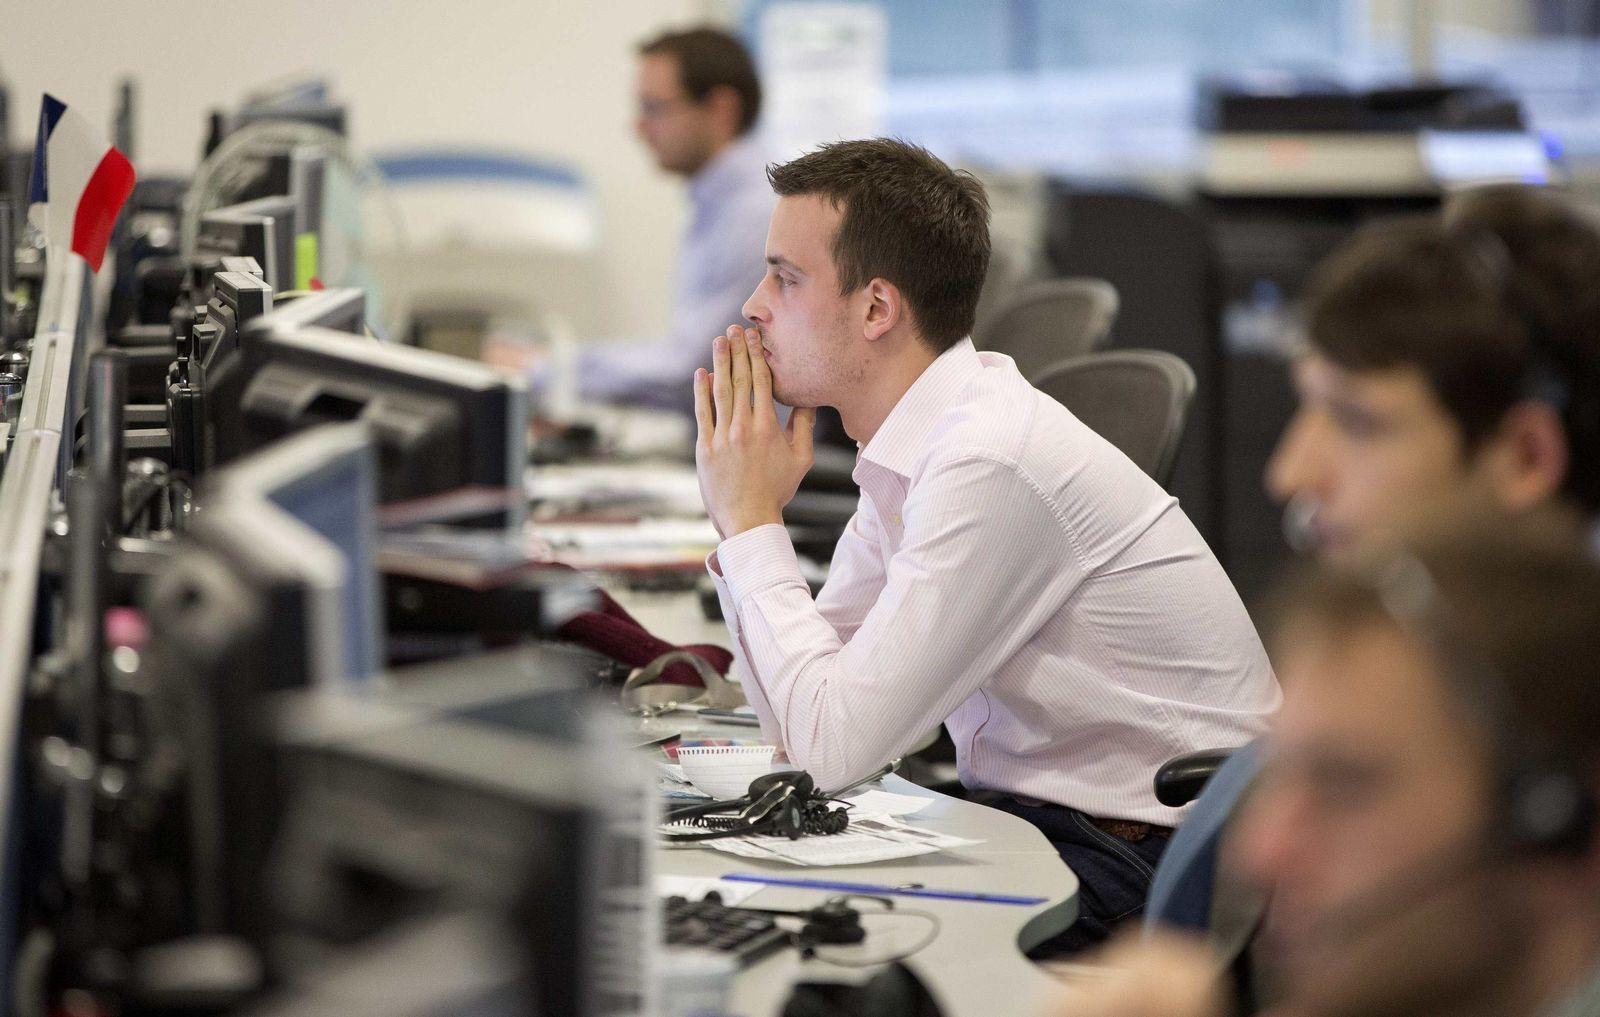 England / Zypern / Finanzkrise